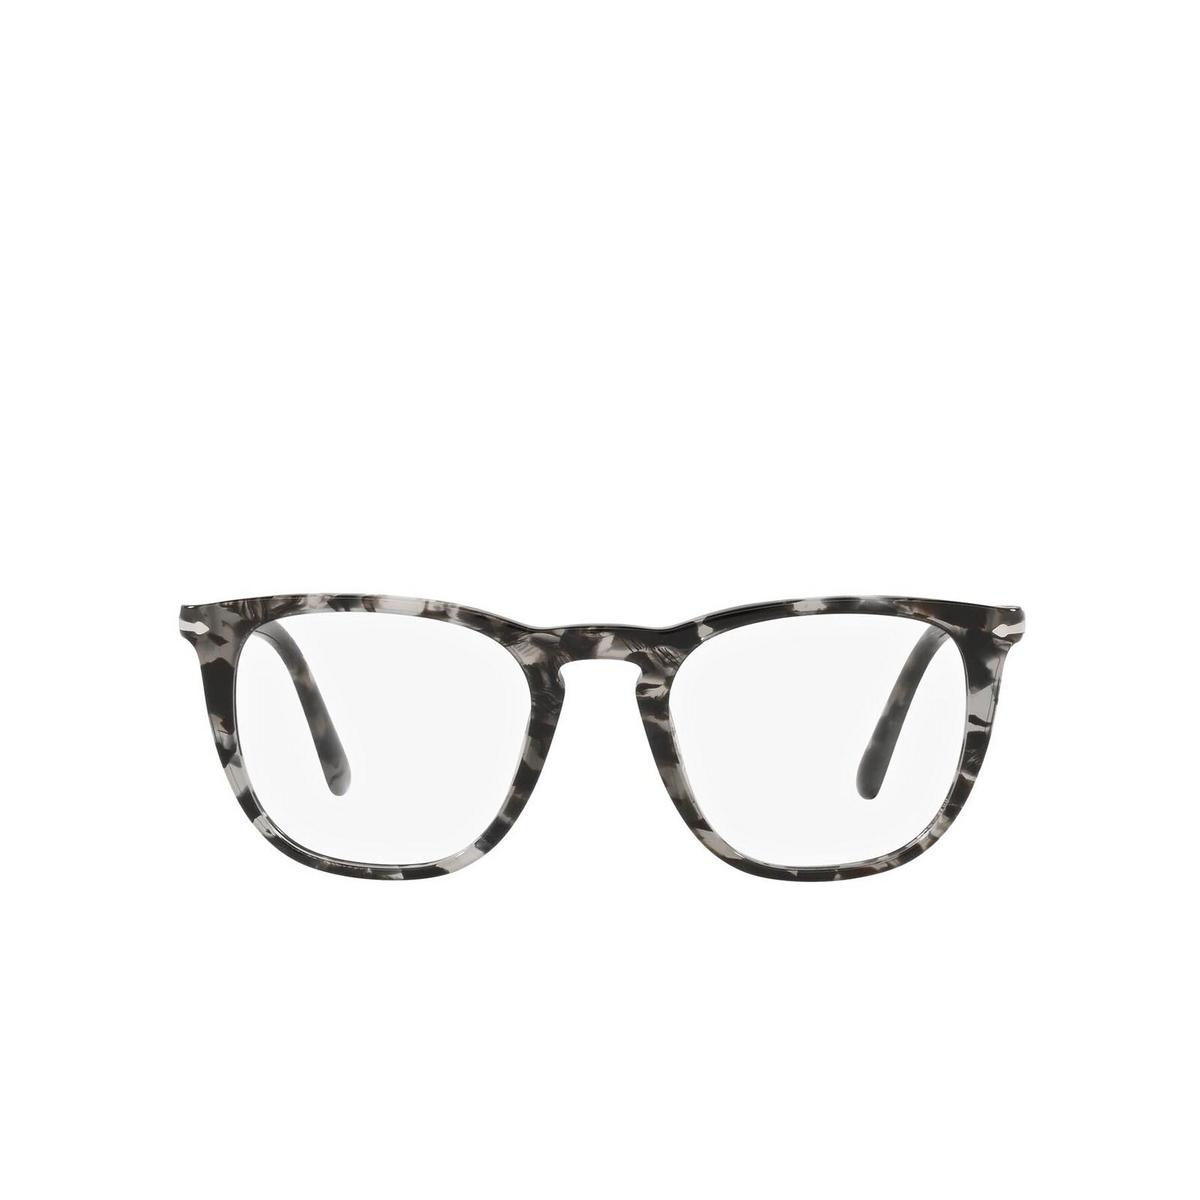 Persol® Square Eyeglasses: PO3266V color Grey Havana 1080 - front view.